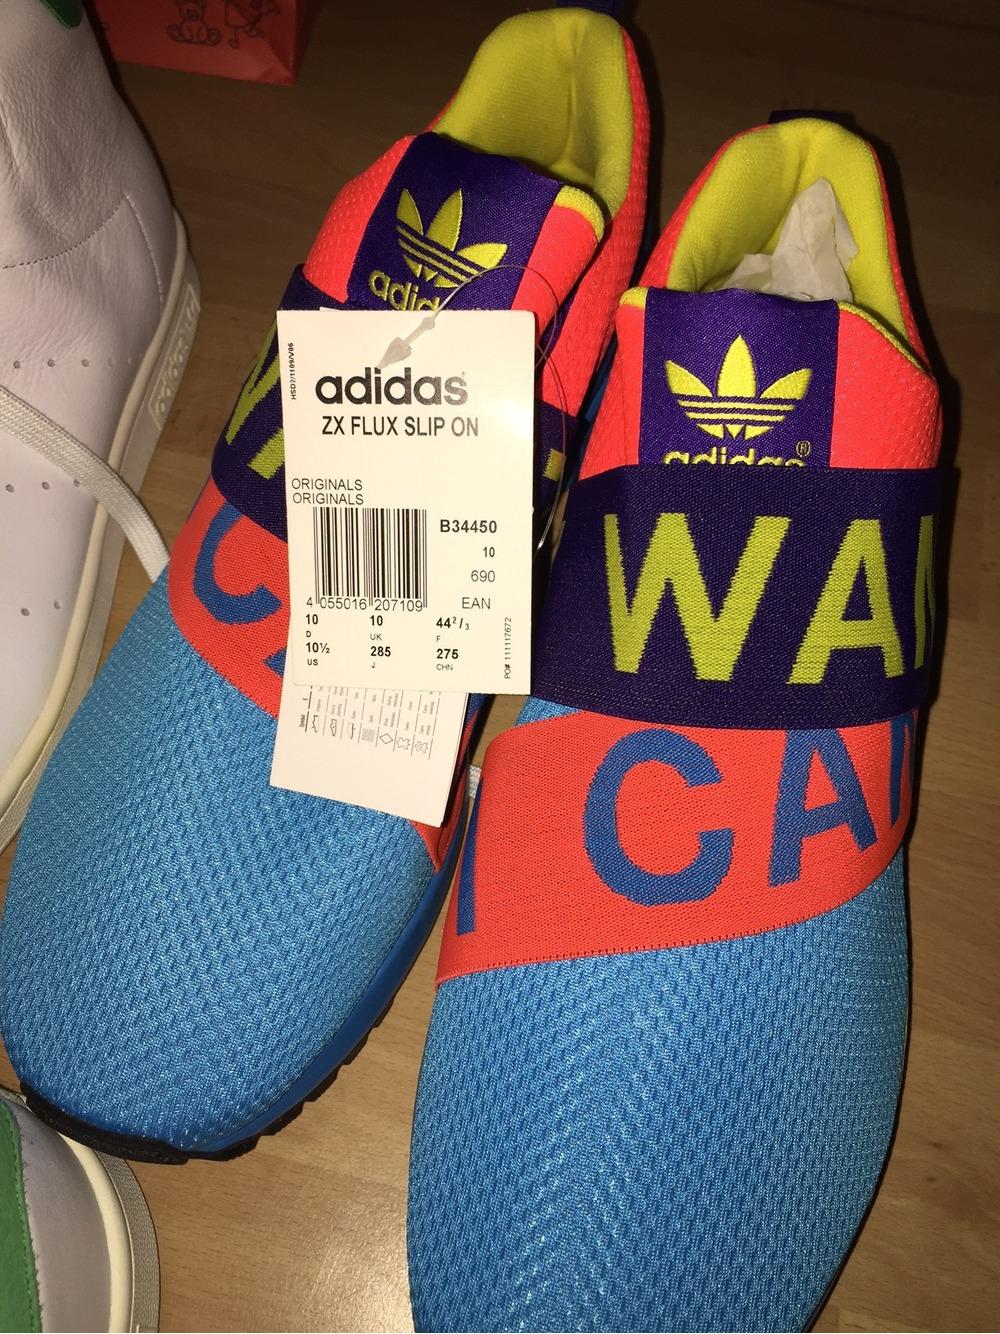 7fecb6beeef9 Adidas ZX Flux Smooth Slip (Womens) (HALF PRICE) WOMENS